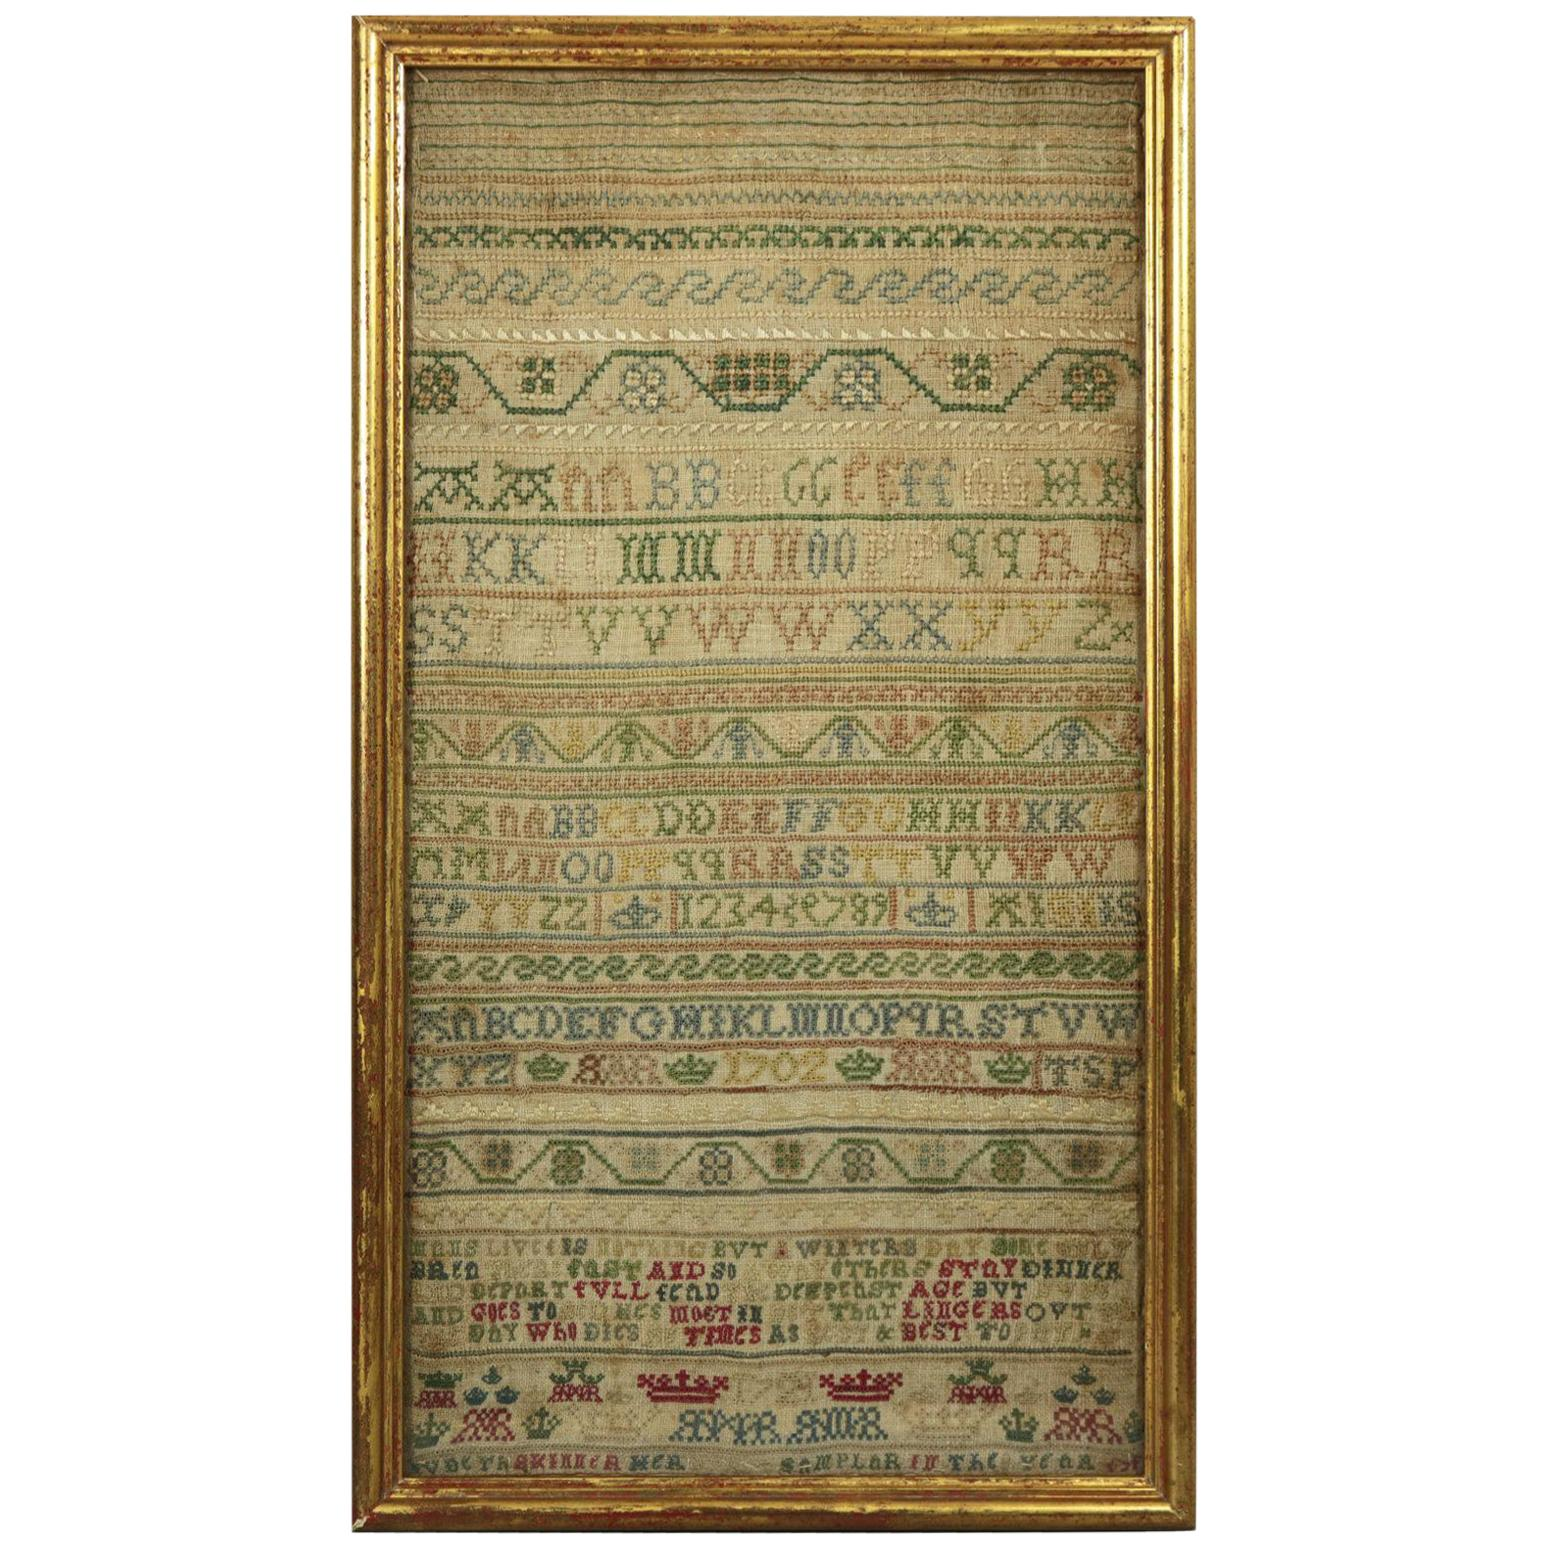 Antique Sampler, 1721 Alphabet Sampler by Judeth Skinner